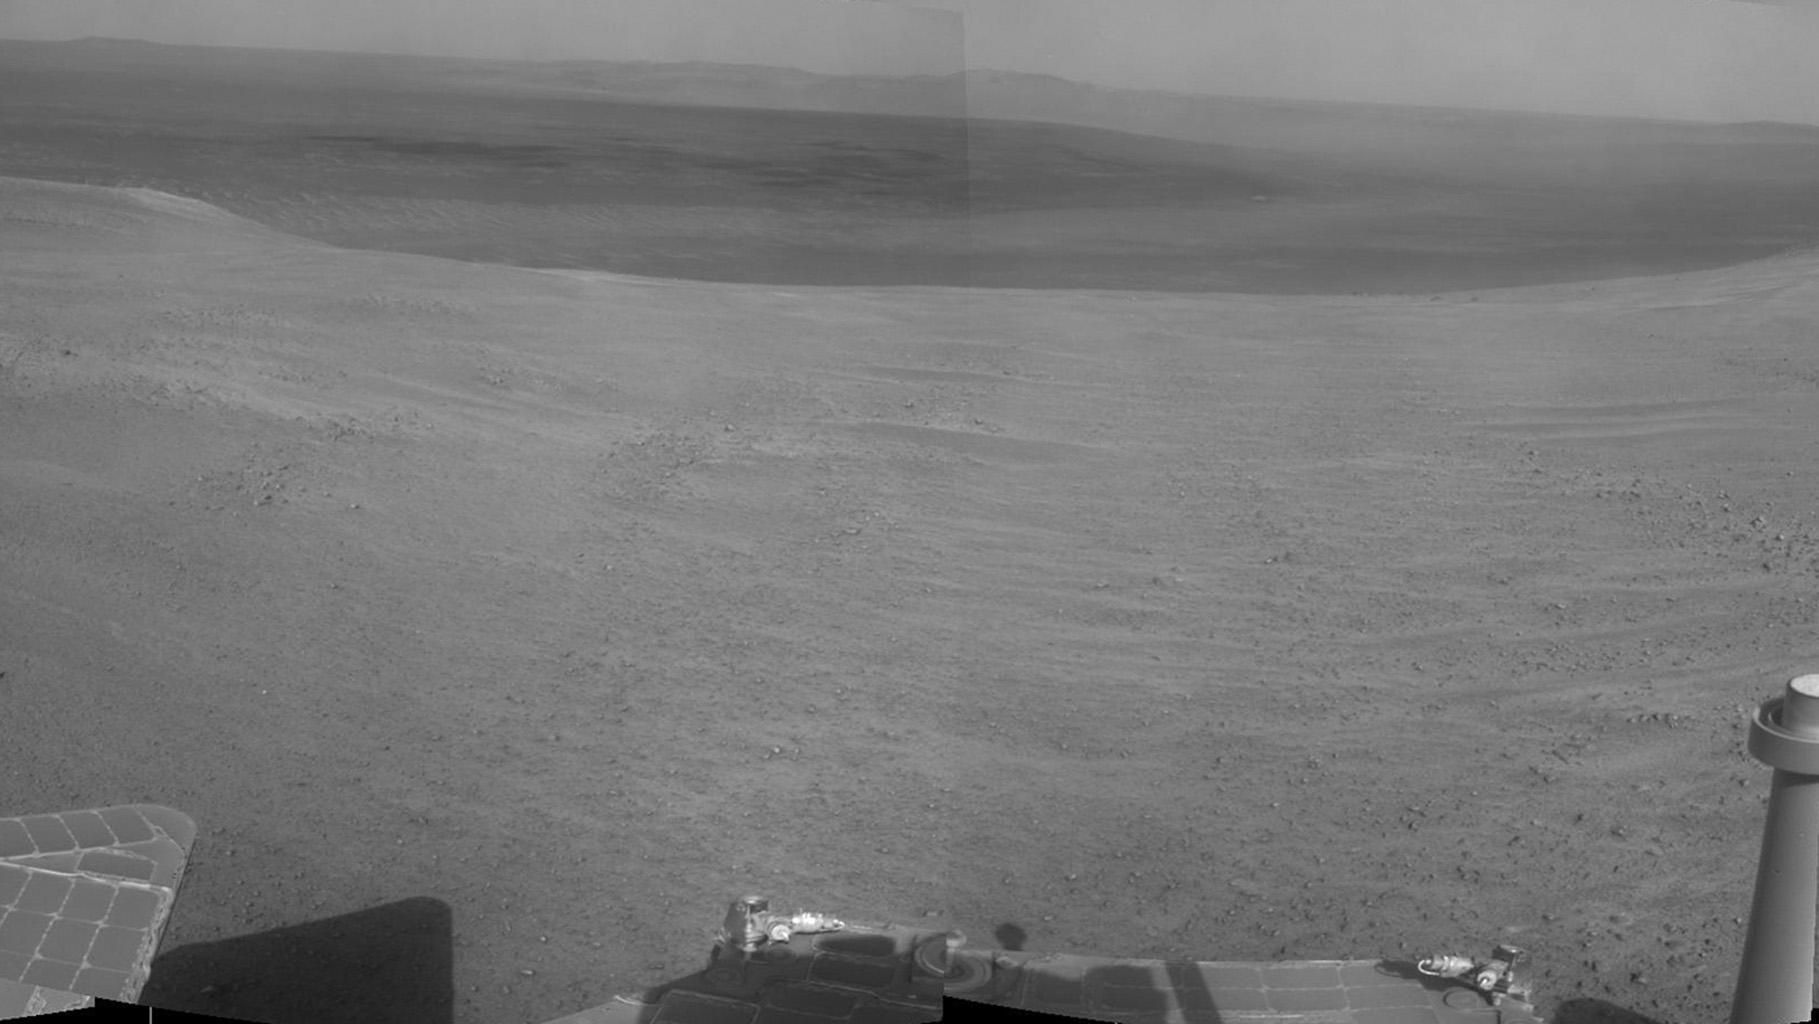 nasa lies about mars - photo #47